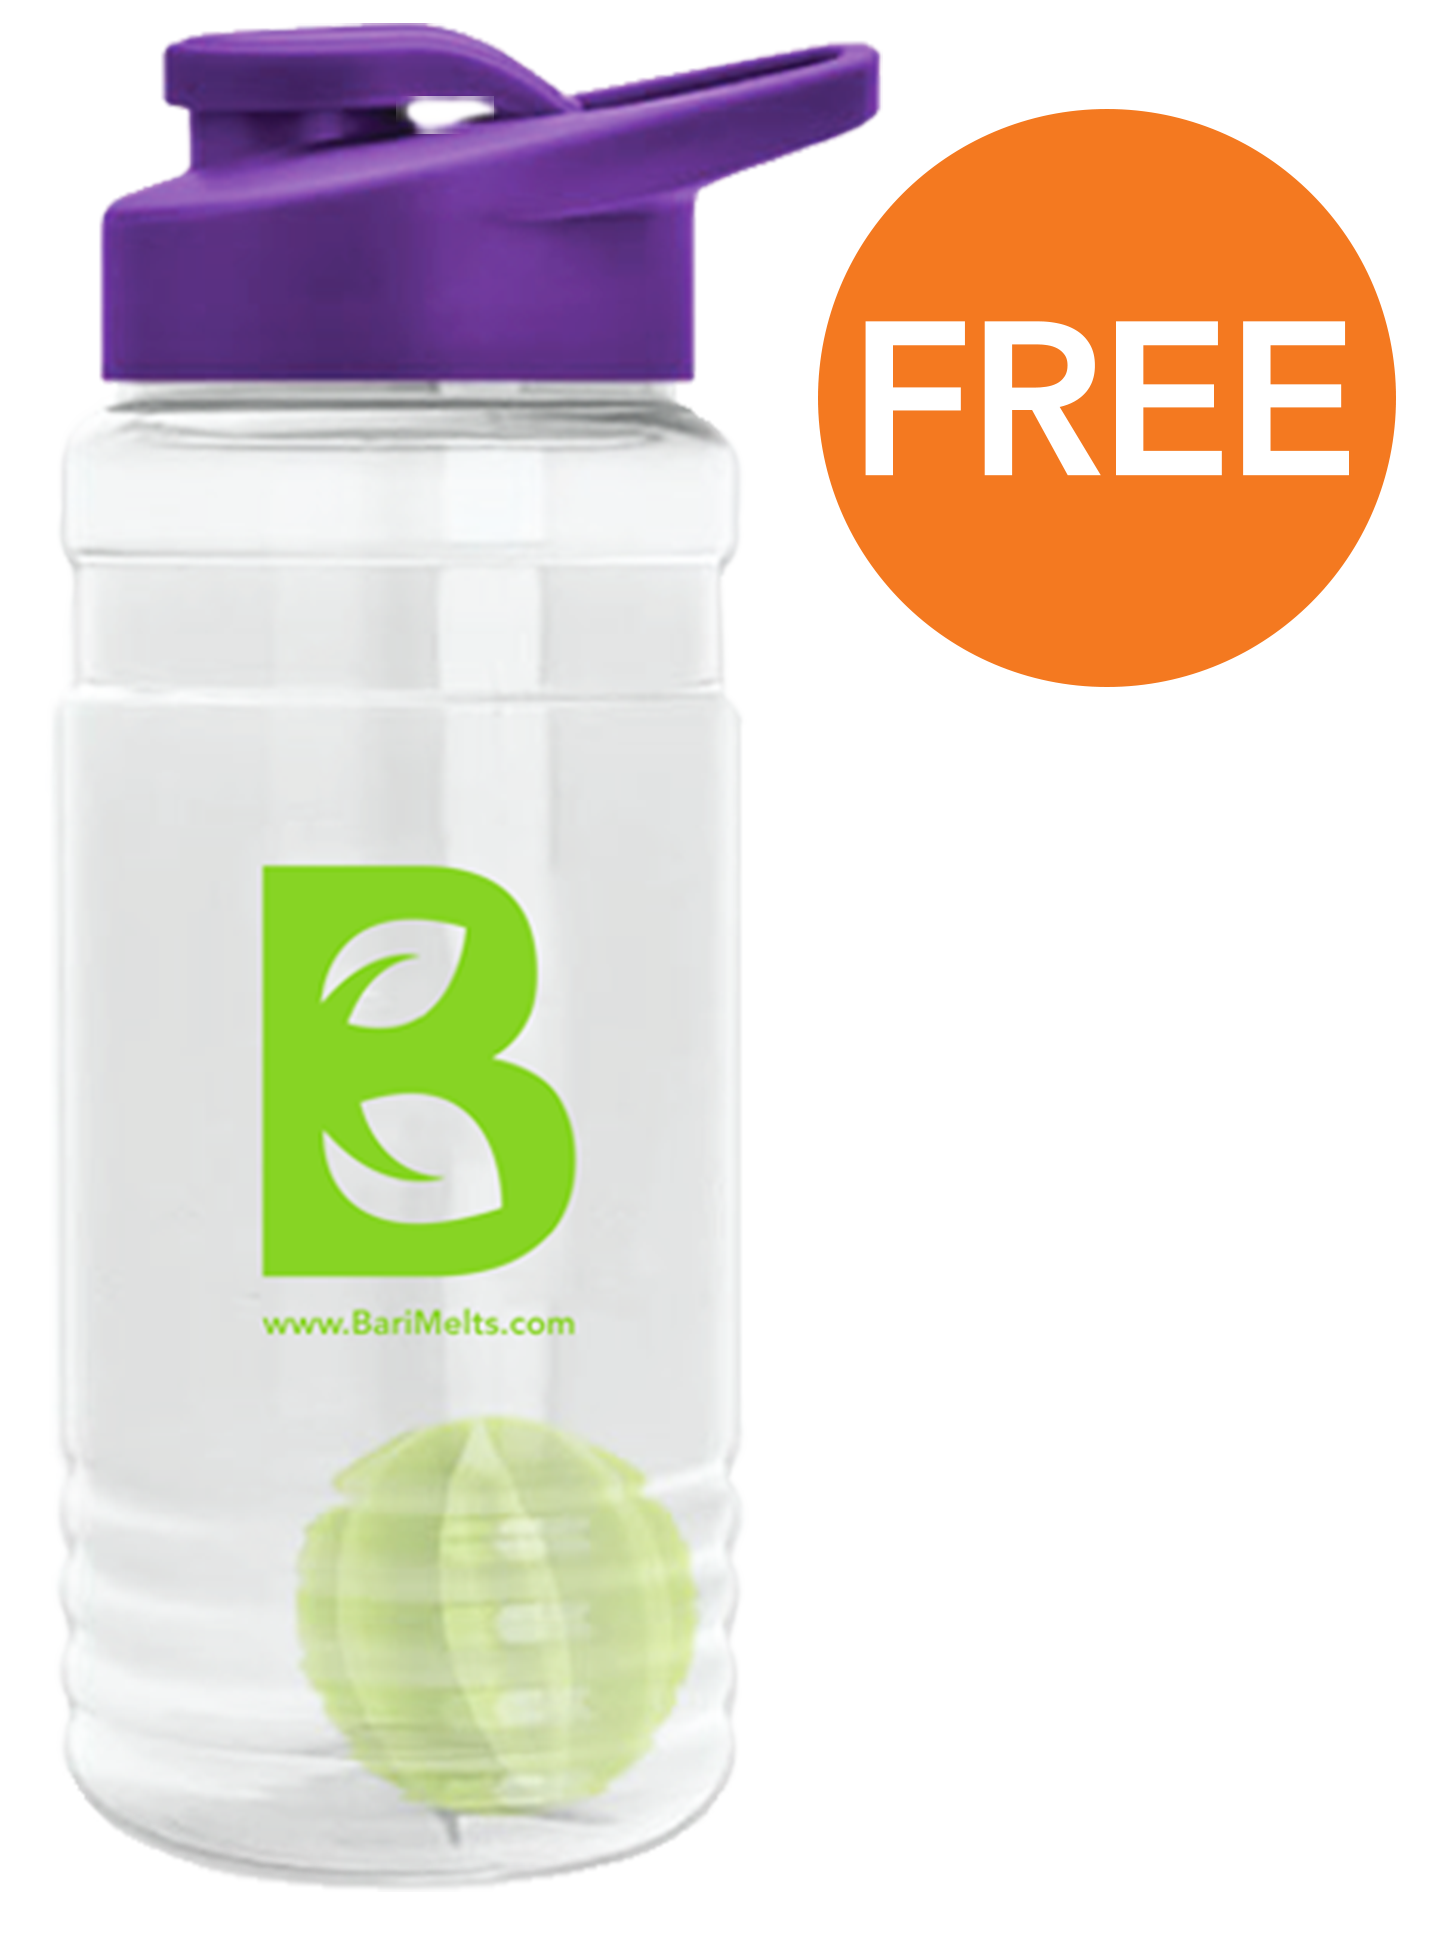 Barimelts shaker bottle